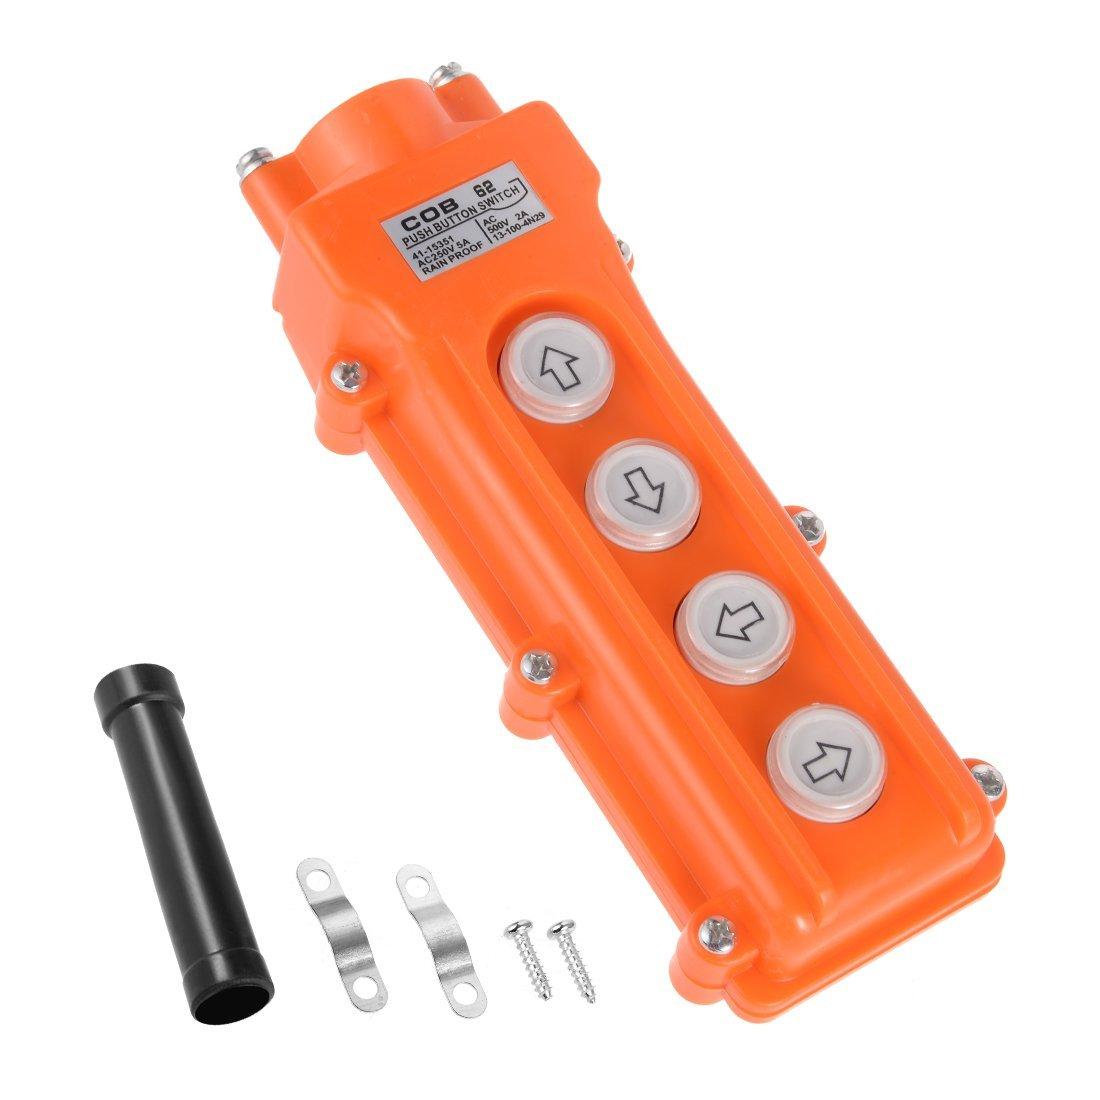 uxcell Rainproof IP55 Hoist Crane Pendant Control Station Push Button Switch Up Down East West 4 Ways